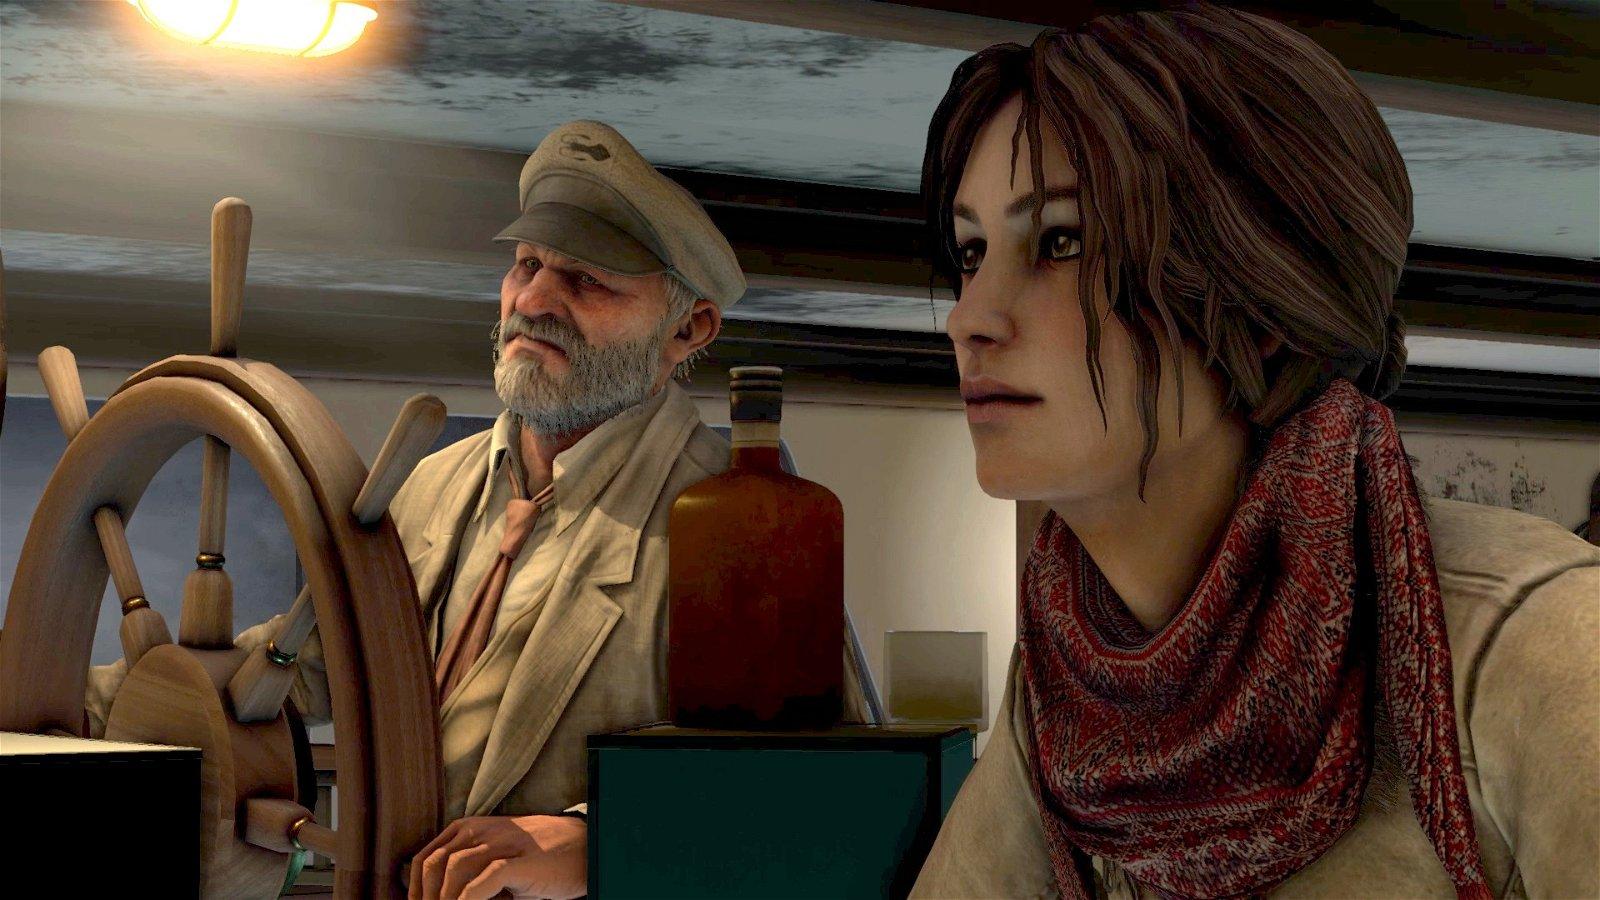 Syberia 3 Review - Awkward Translation 1